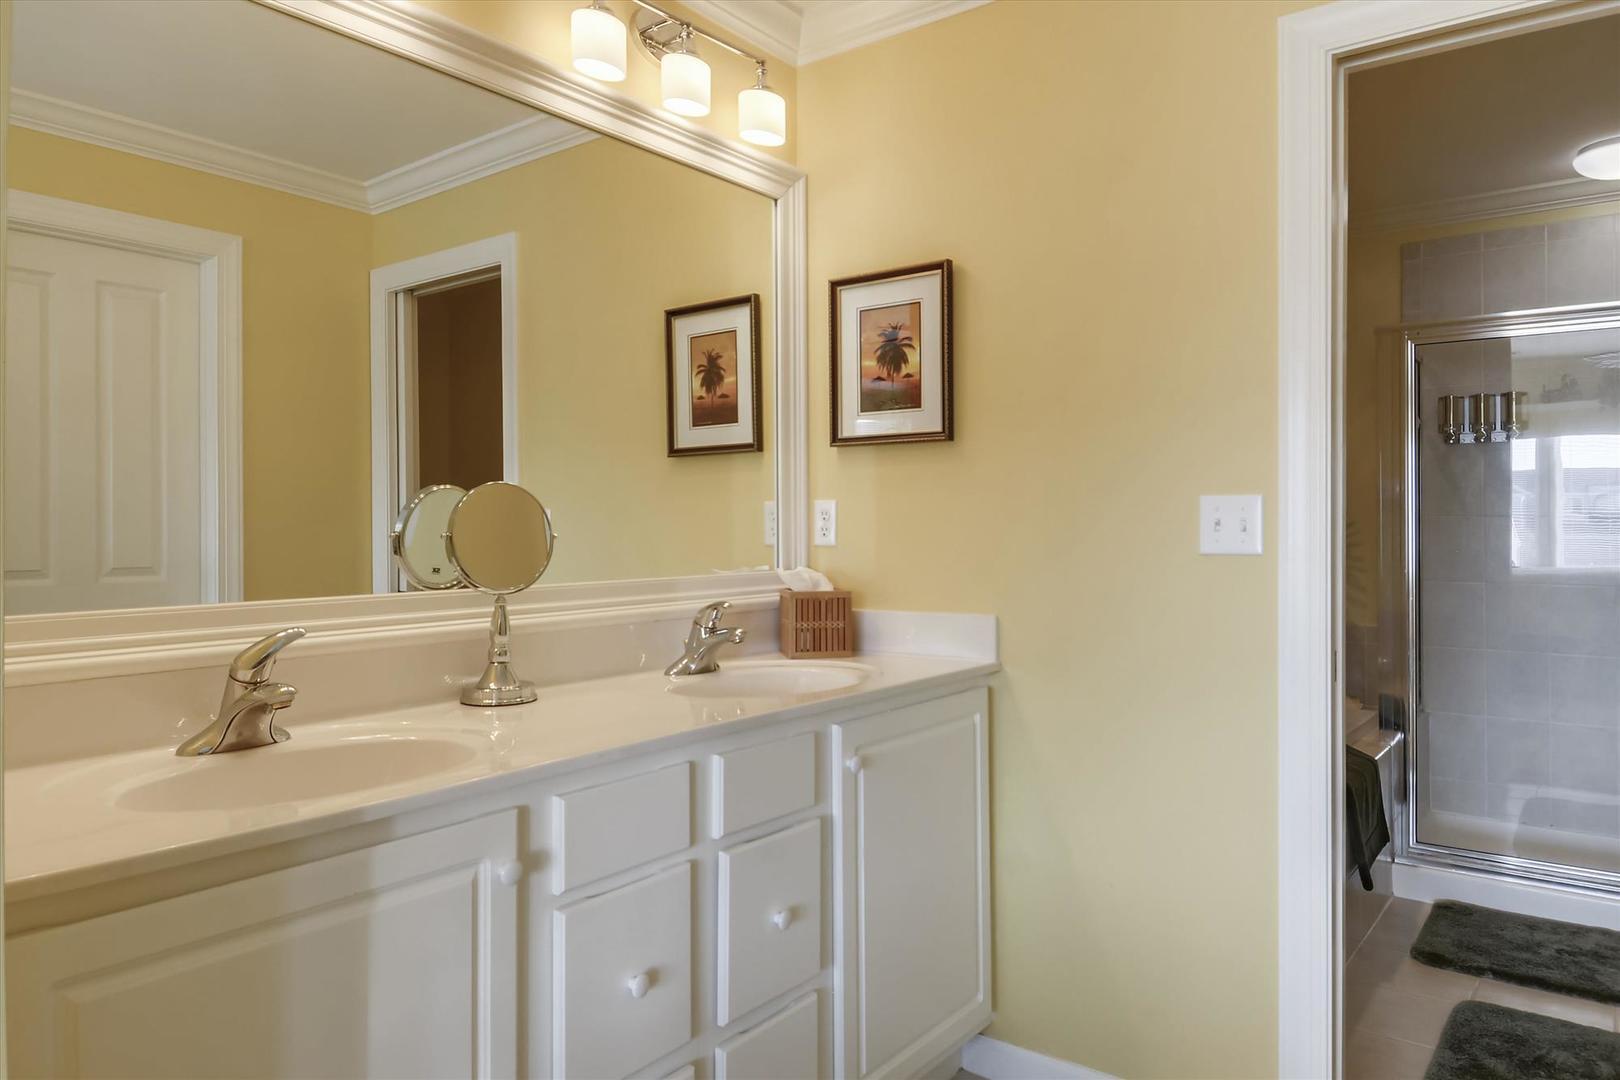 Bayville Shores 1169 - Upper Level Master Bathroom 2